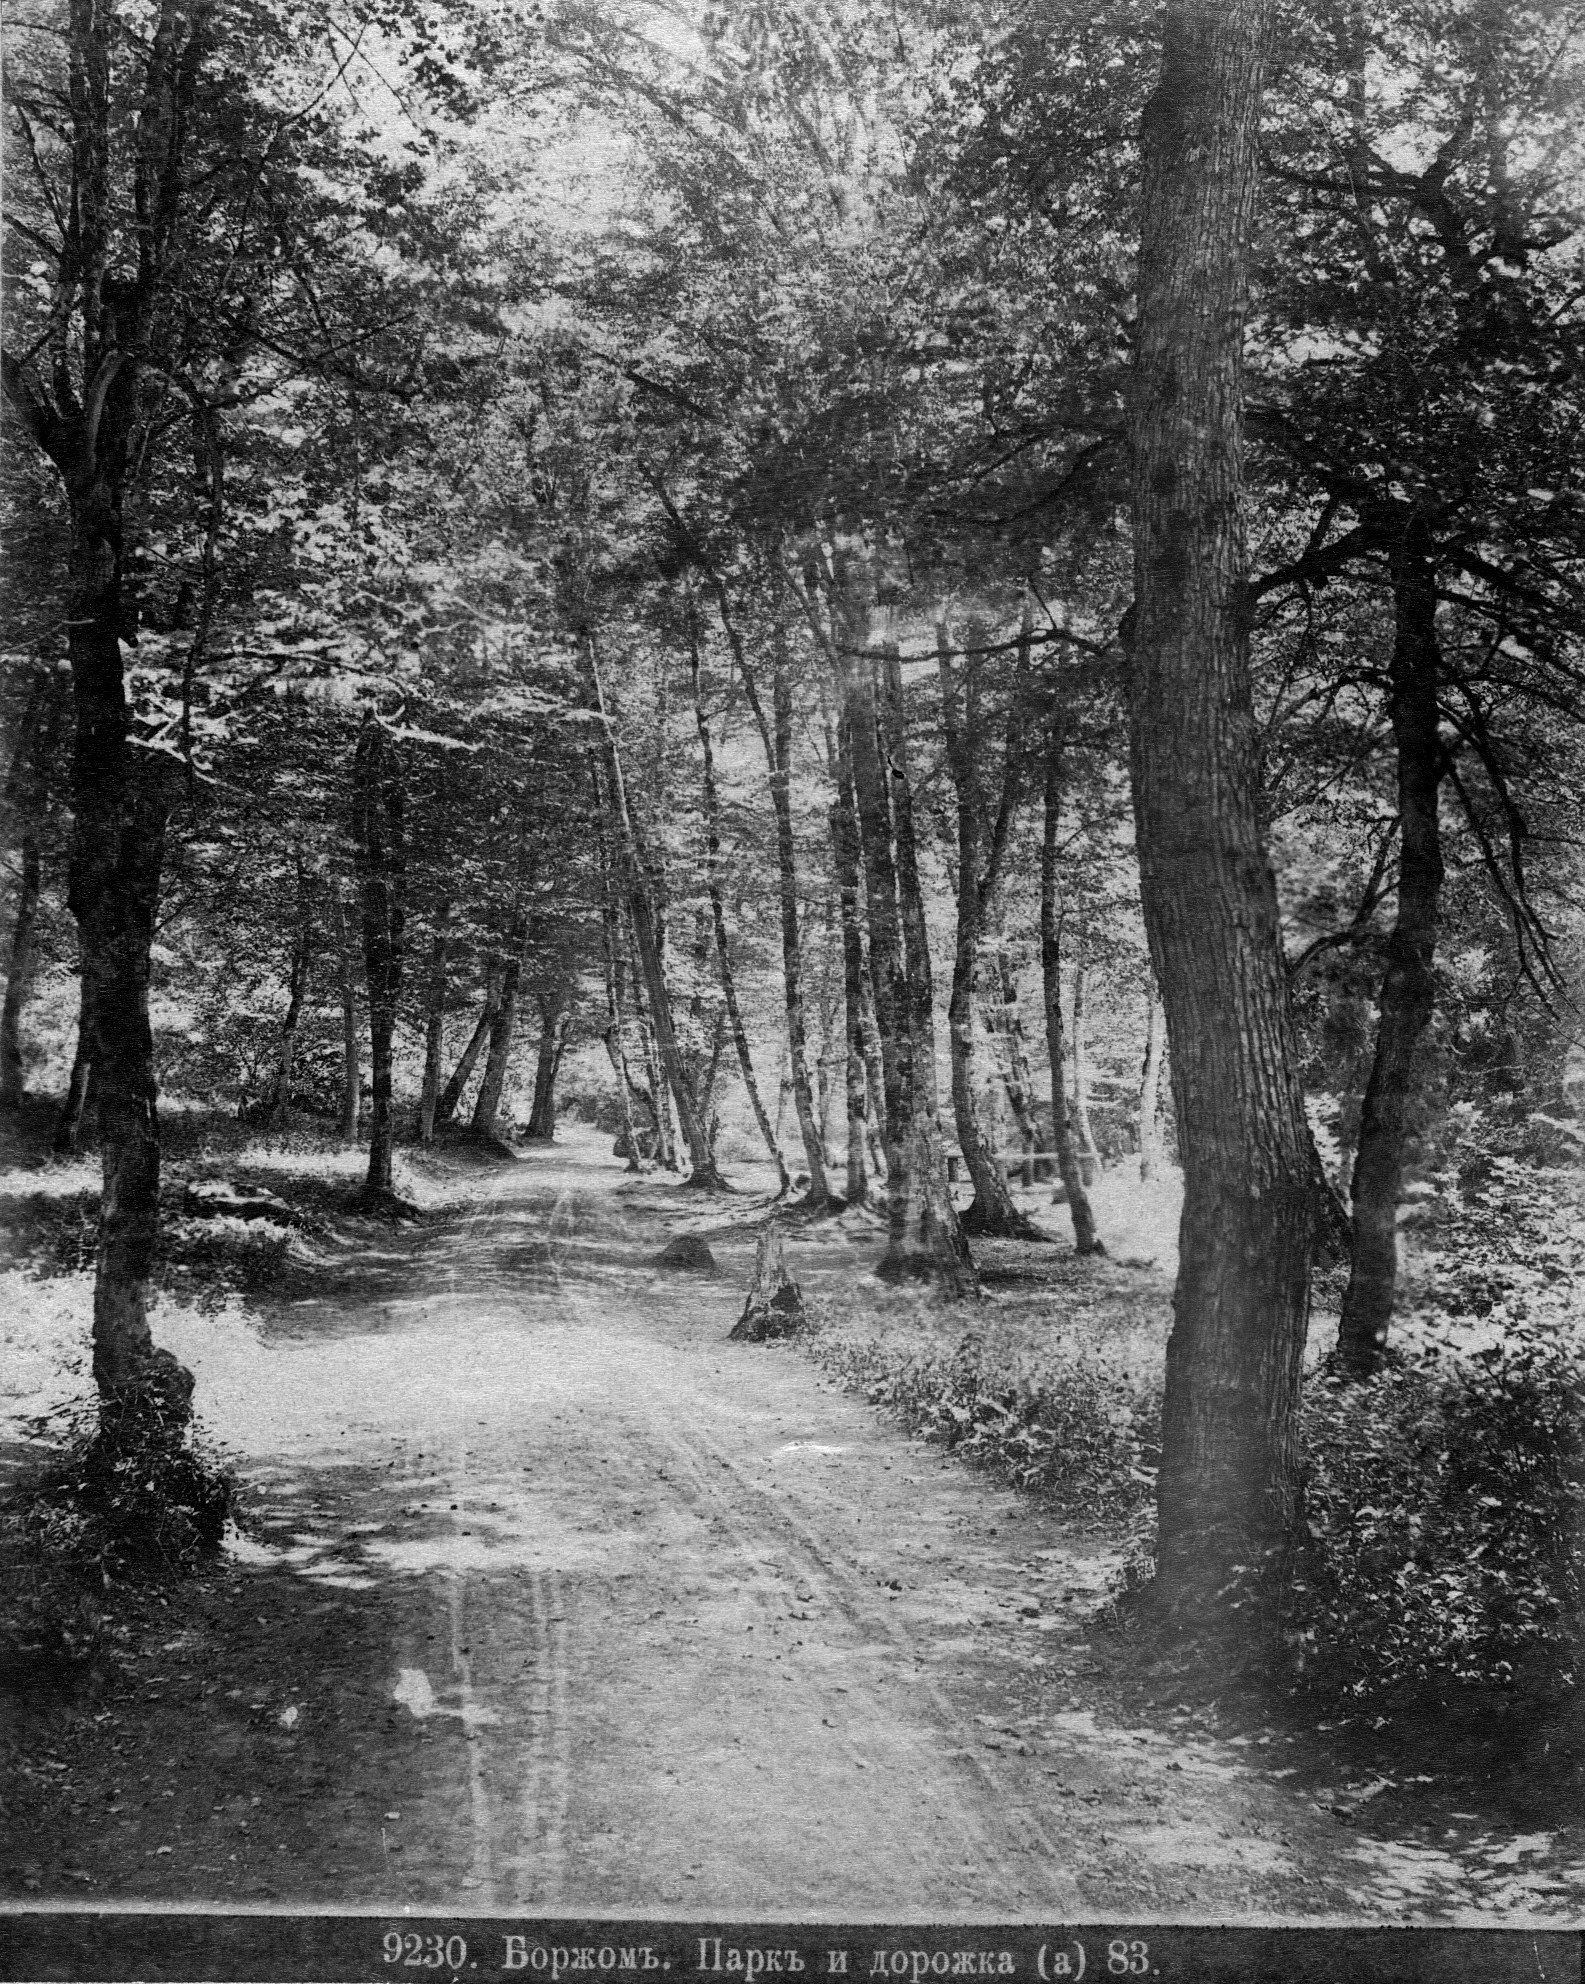 Парк и дорожка